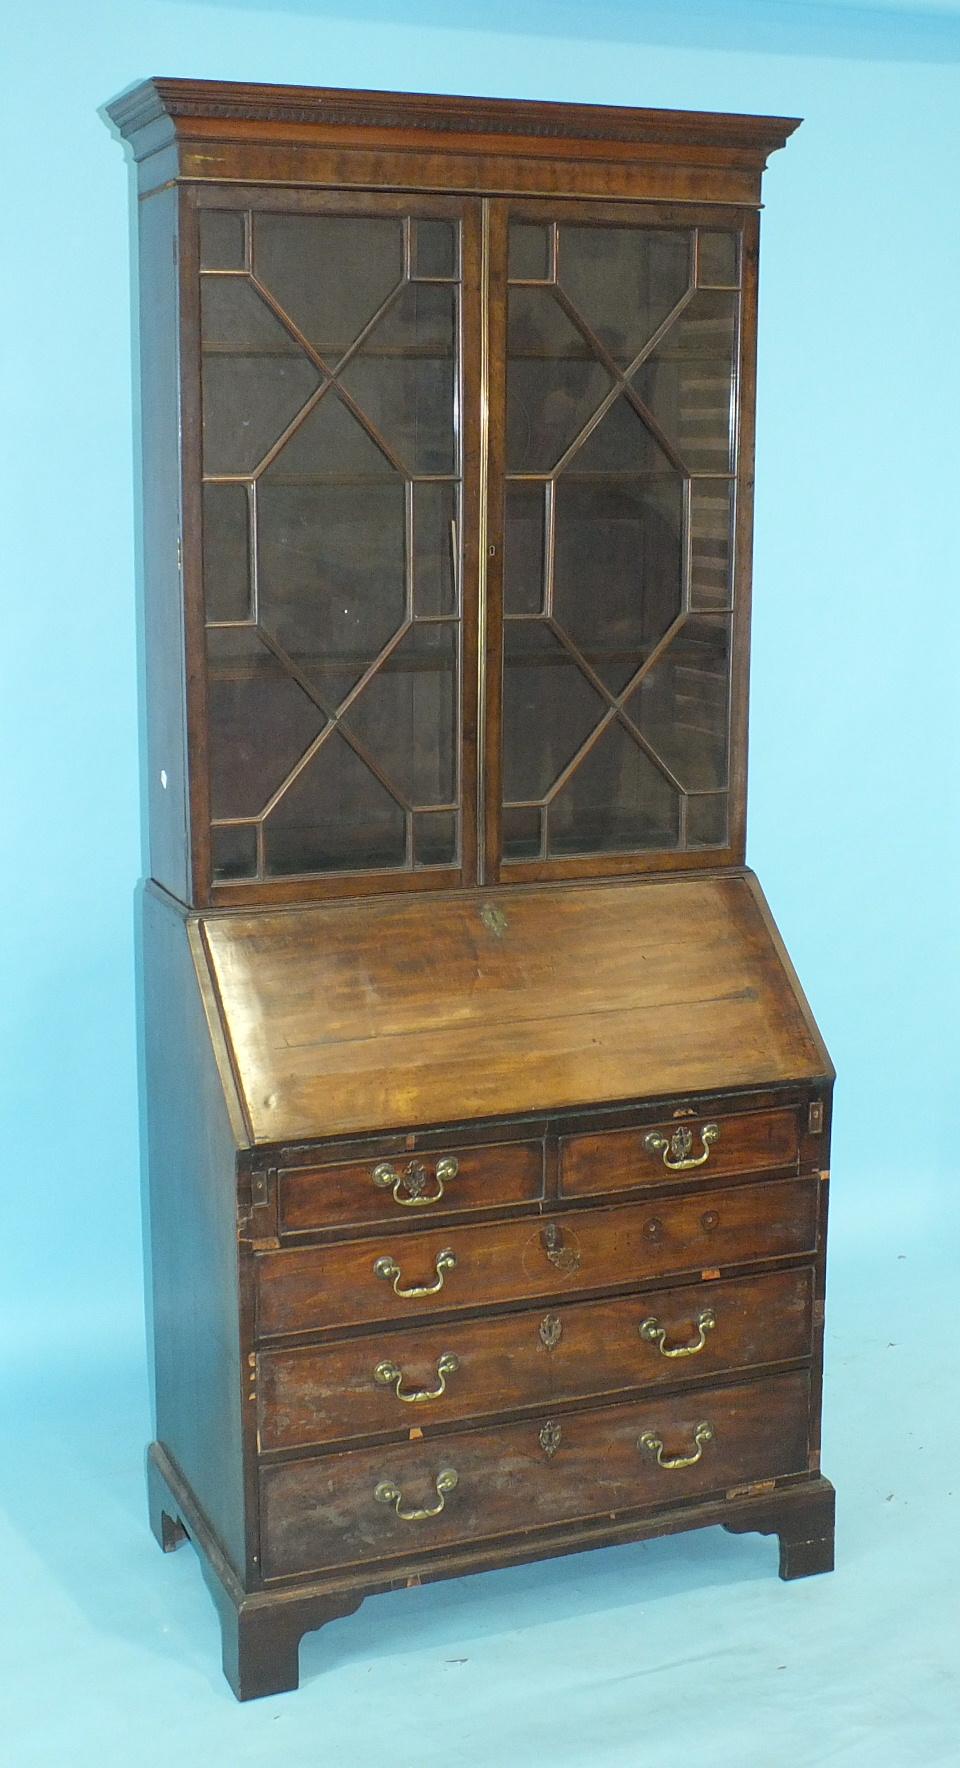 Lot 22 - A Georgian bureau/bookcase, the dentil cornice above a pair of astragal-glazed doors, the fall front